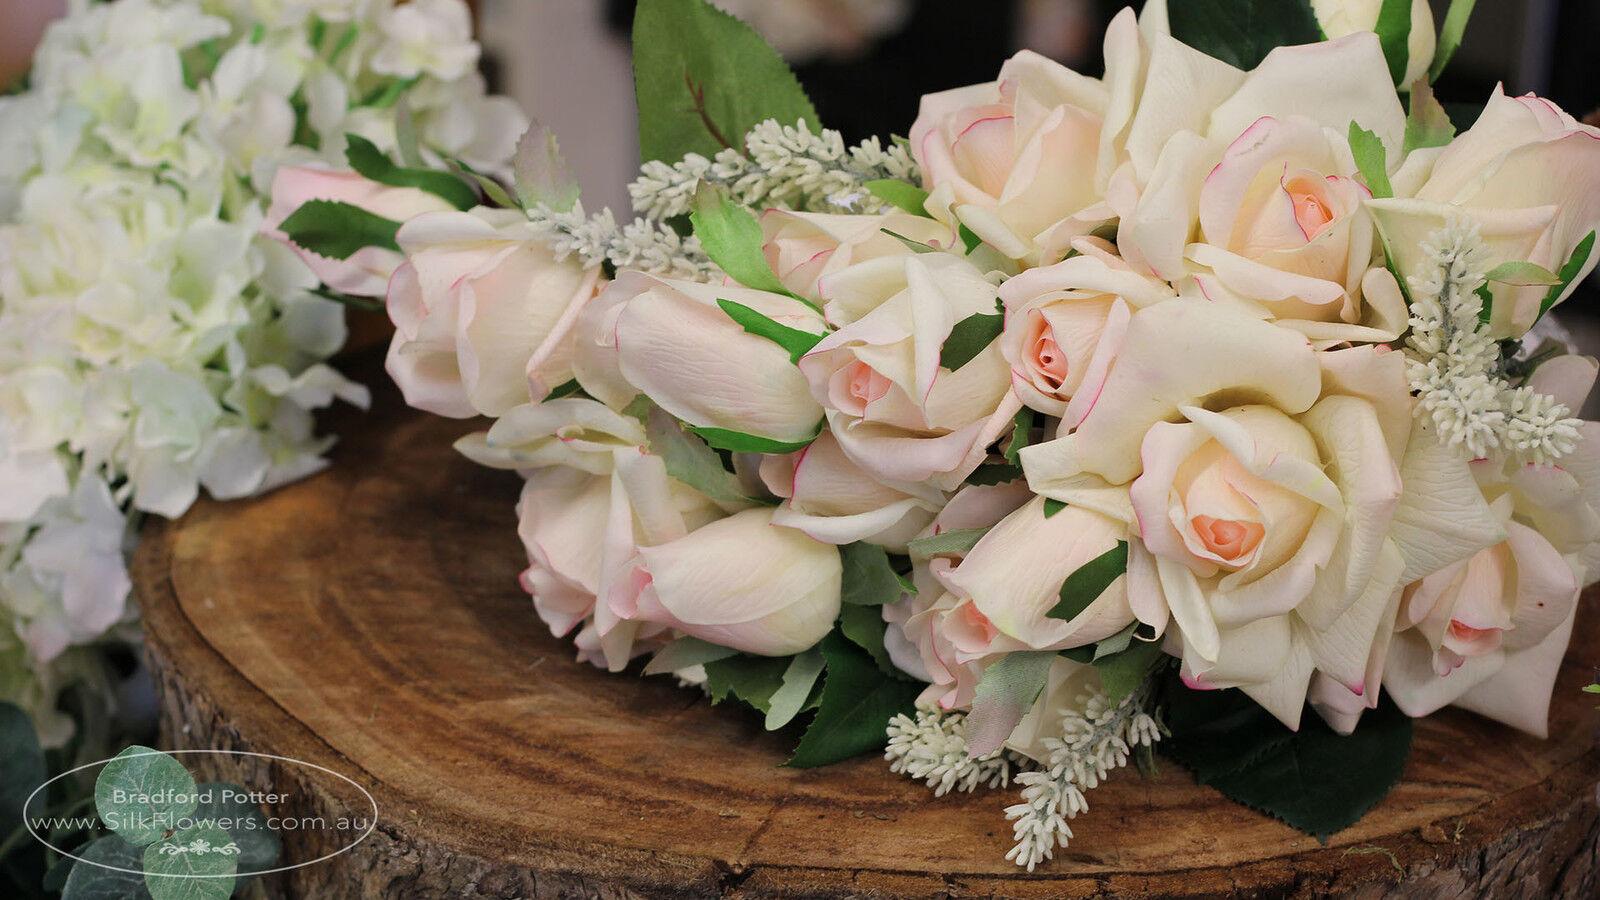 Husky Silk Flowers